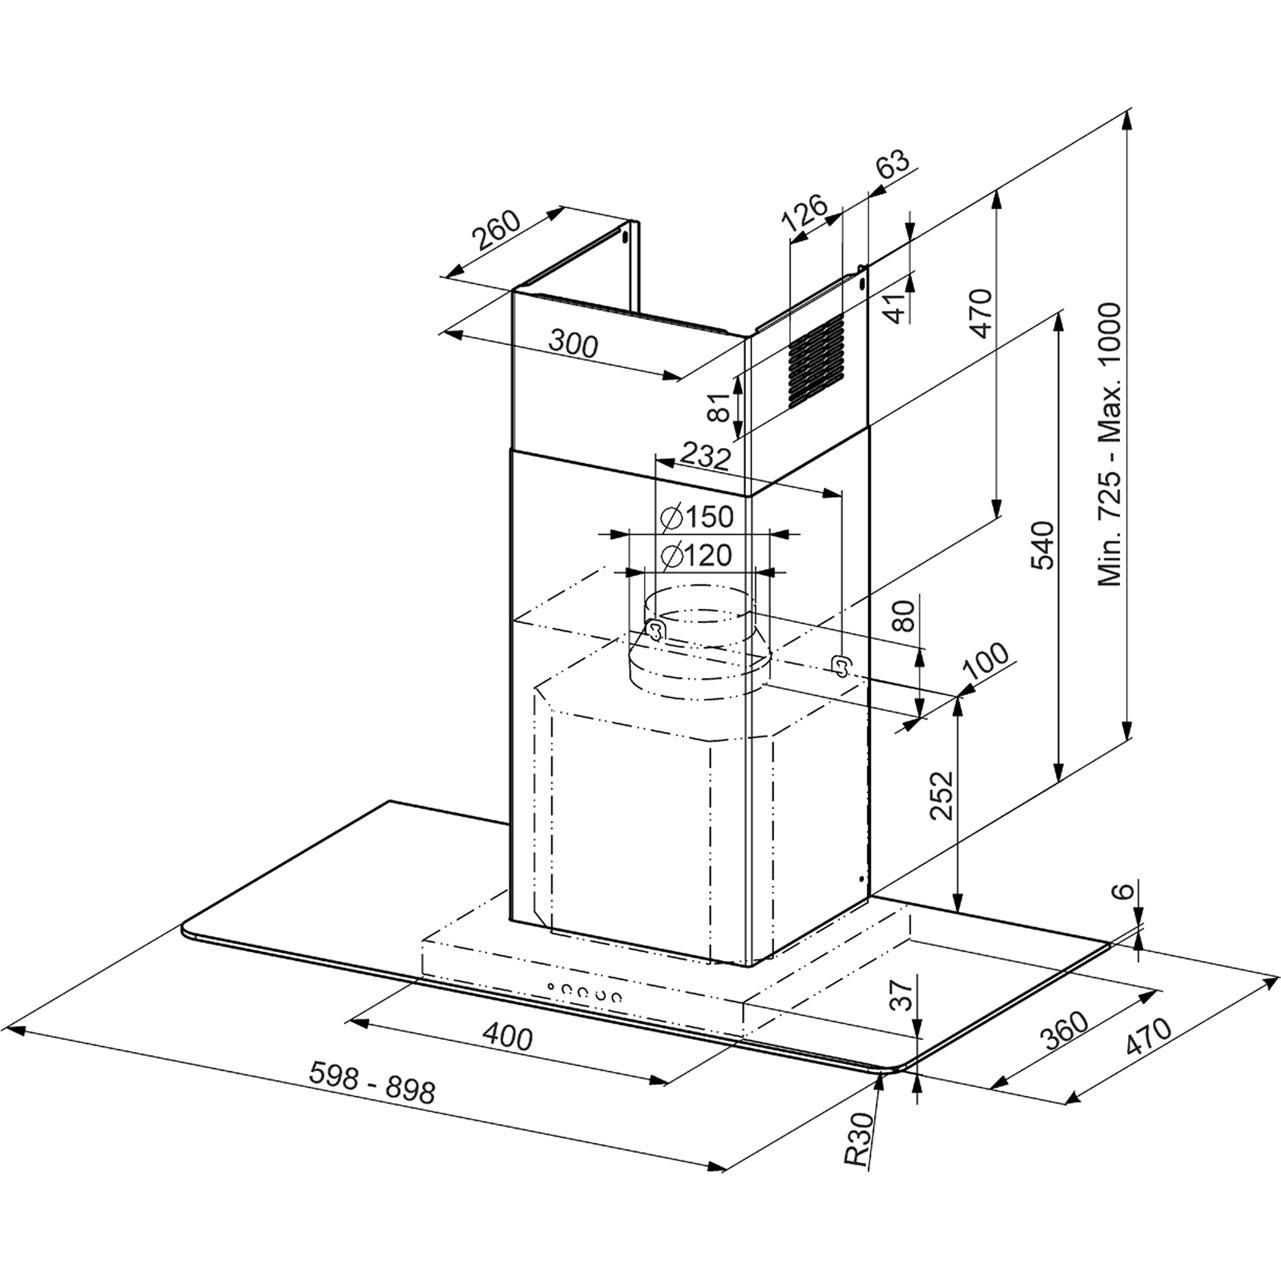 kfv92dne_ss_smeg_cookerhood_dim_l?resize=665%2C664&ssl=1 rangemaster cooker hood wiring diagram wiring diagram rangemaster cooker hood wiring diagram at suagrazia.org